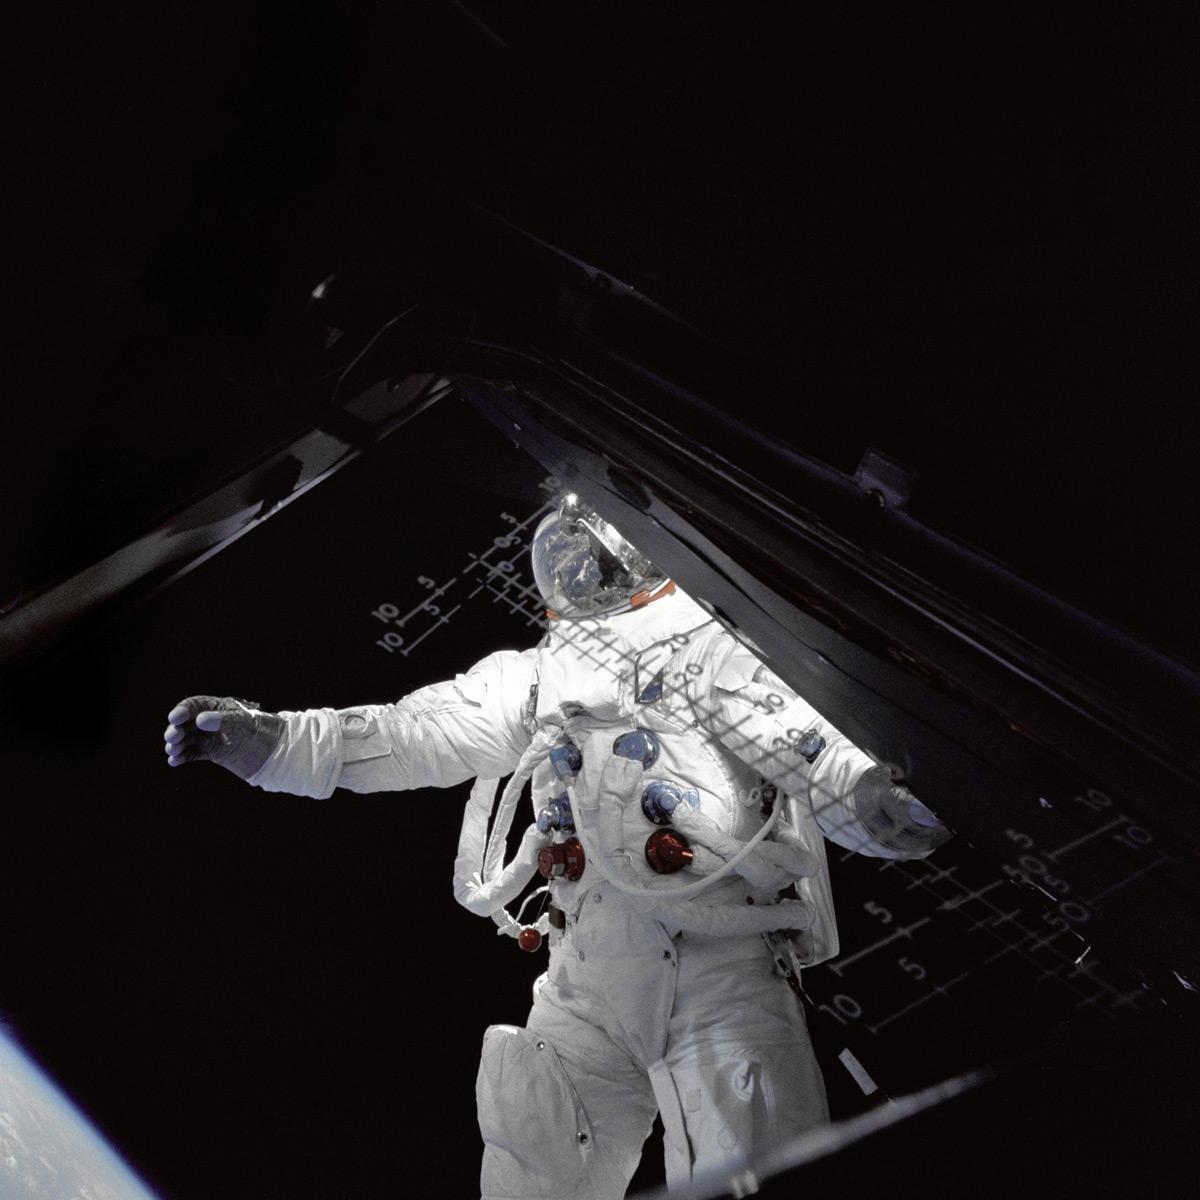 Apollo 9 — First Crewed Lunar Module Test